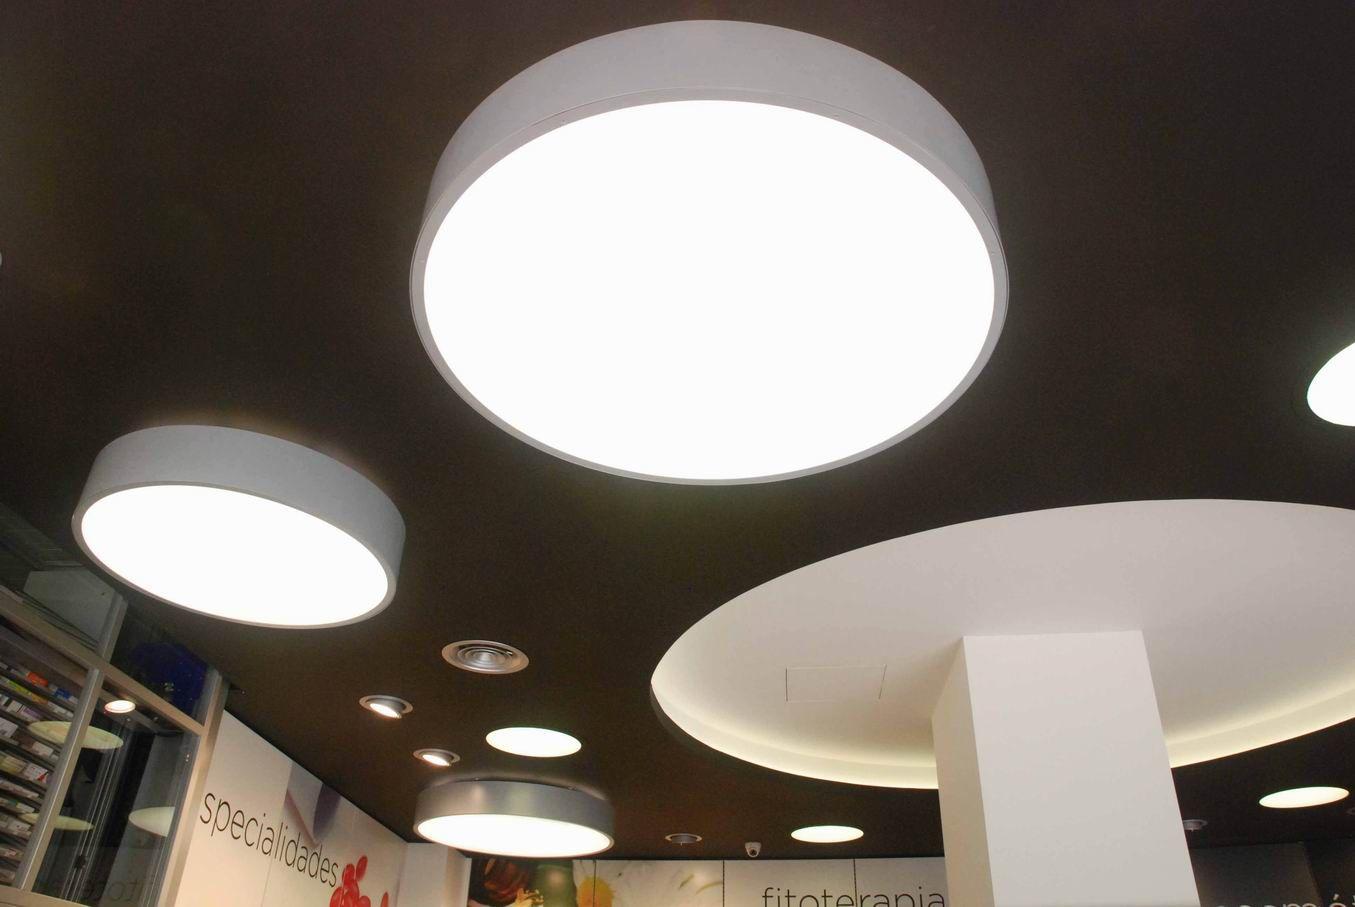 Proyecto de iluminacion farmacia iluminaci n - Iluminacion bilbao ...